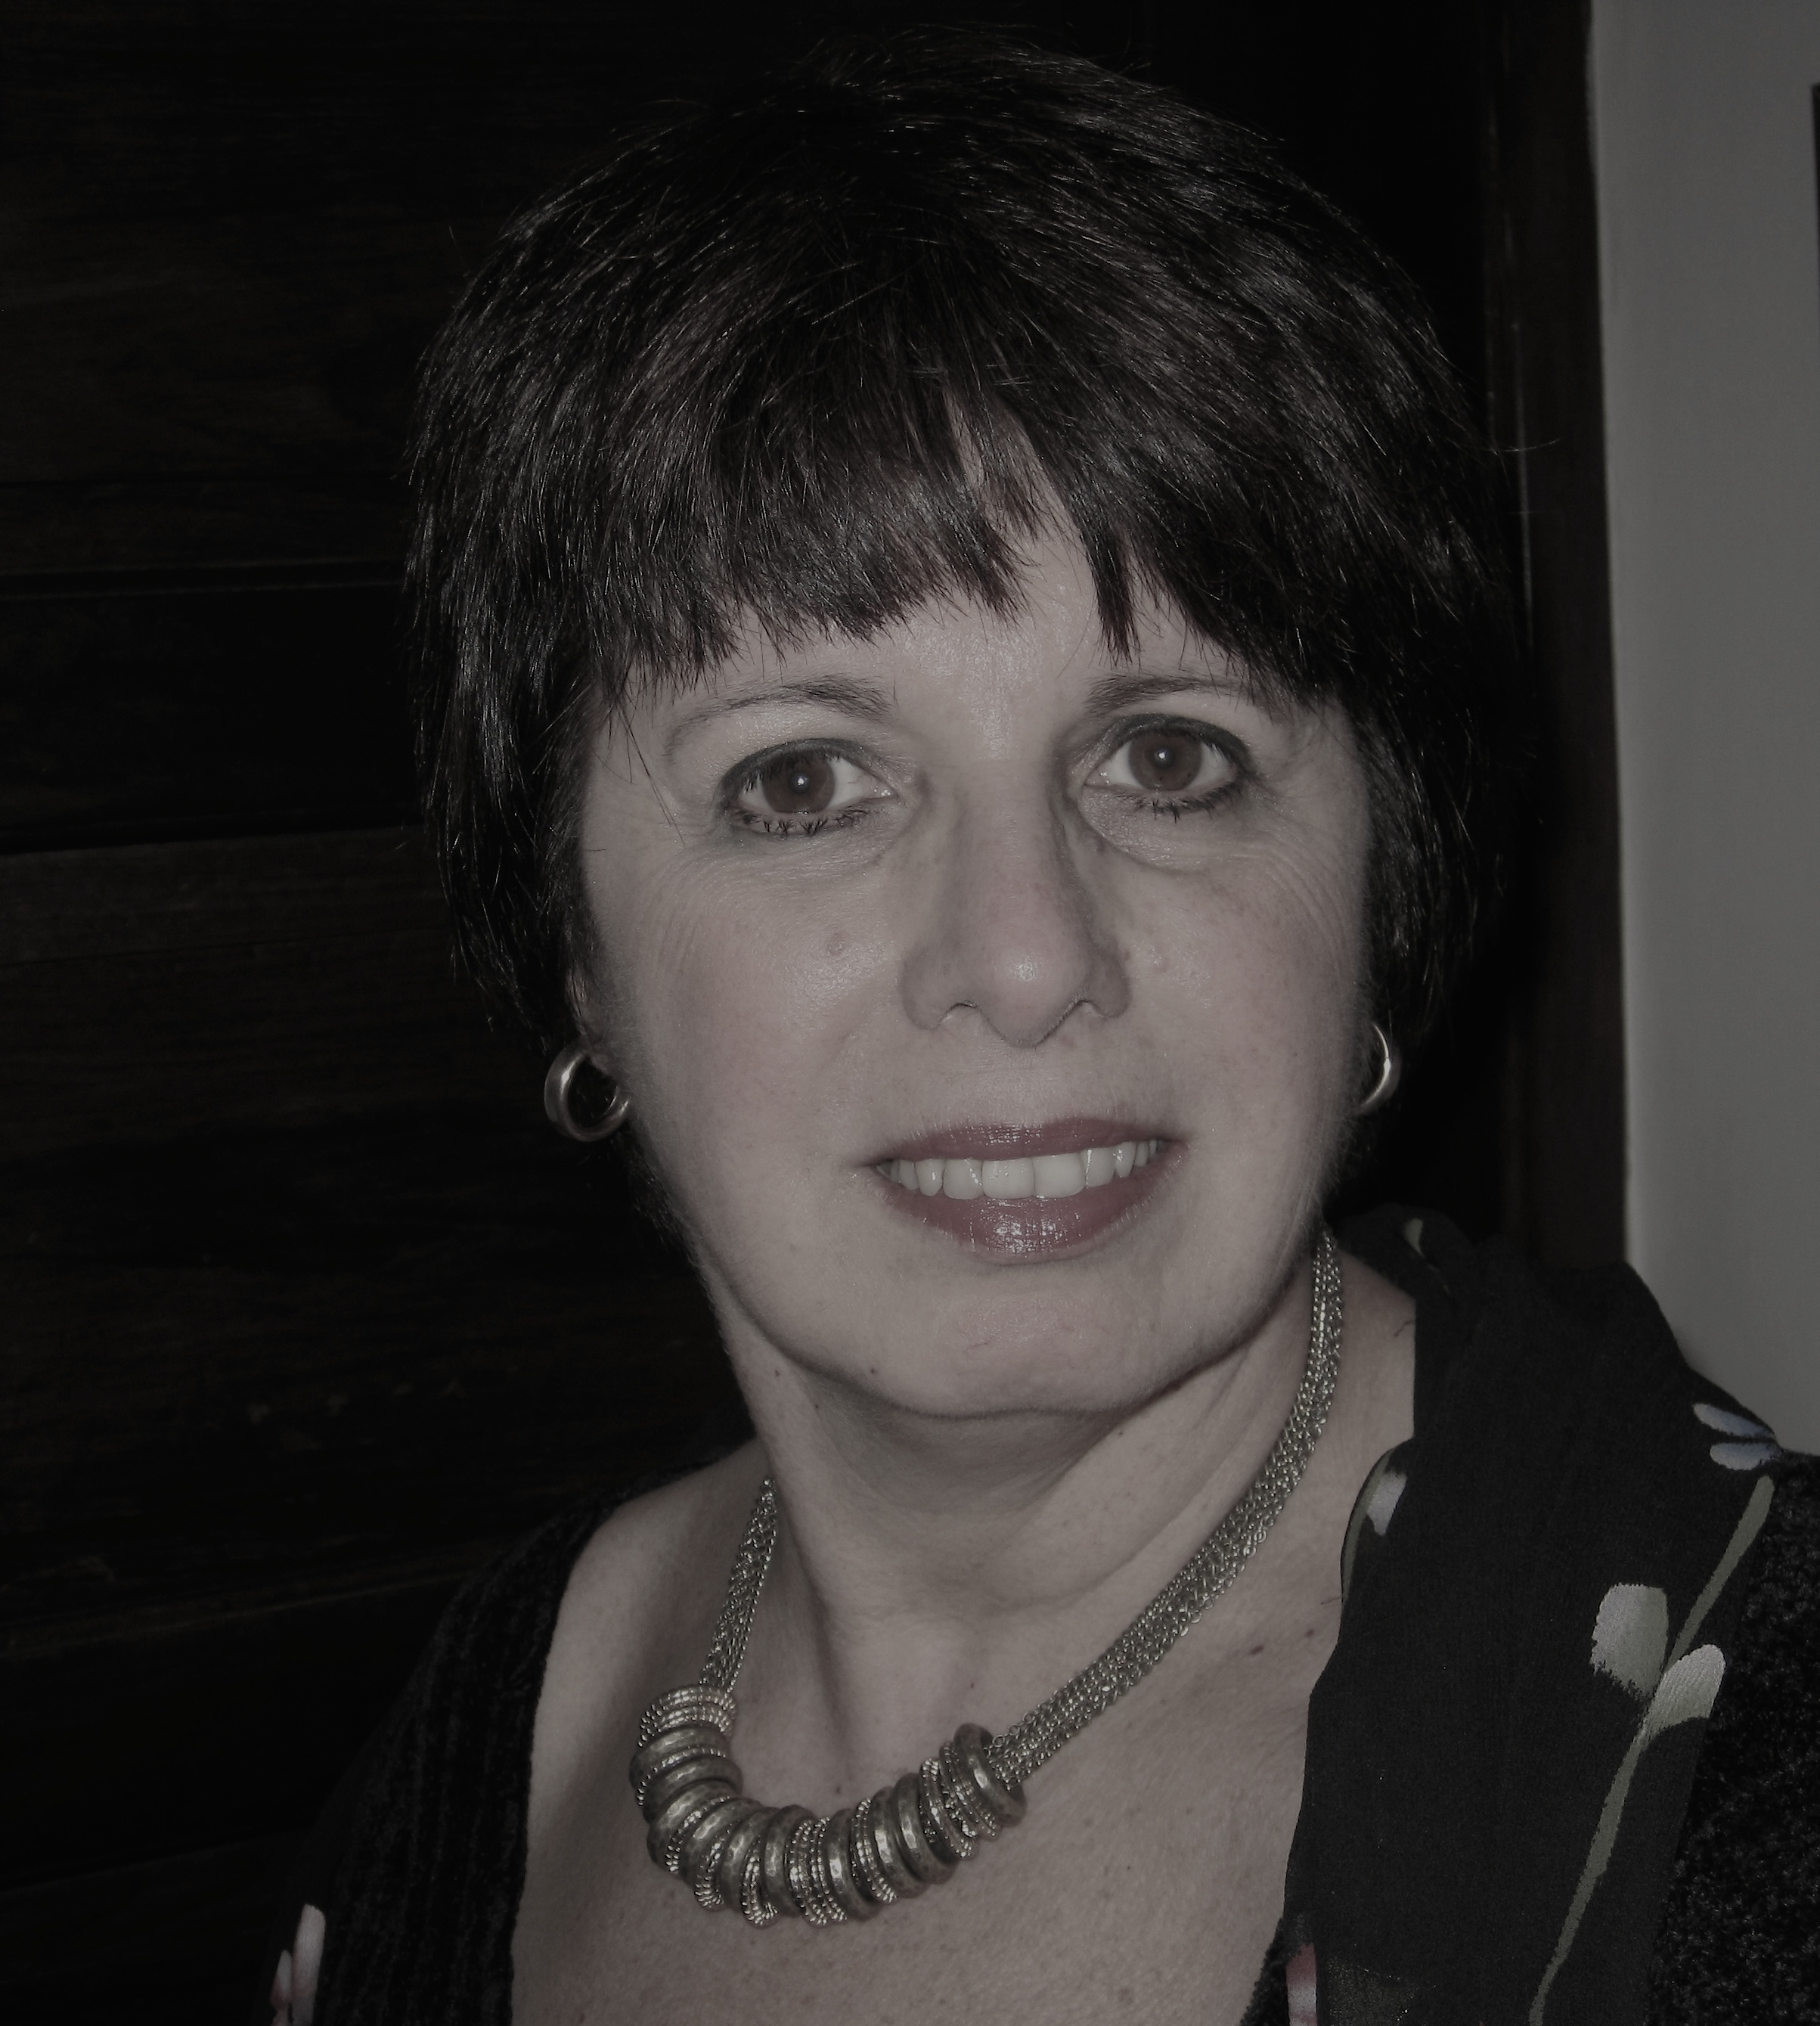 Maria Luiza Tucci Carneiro